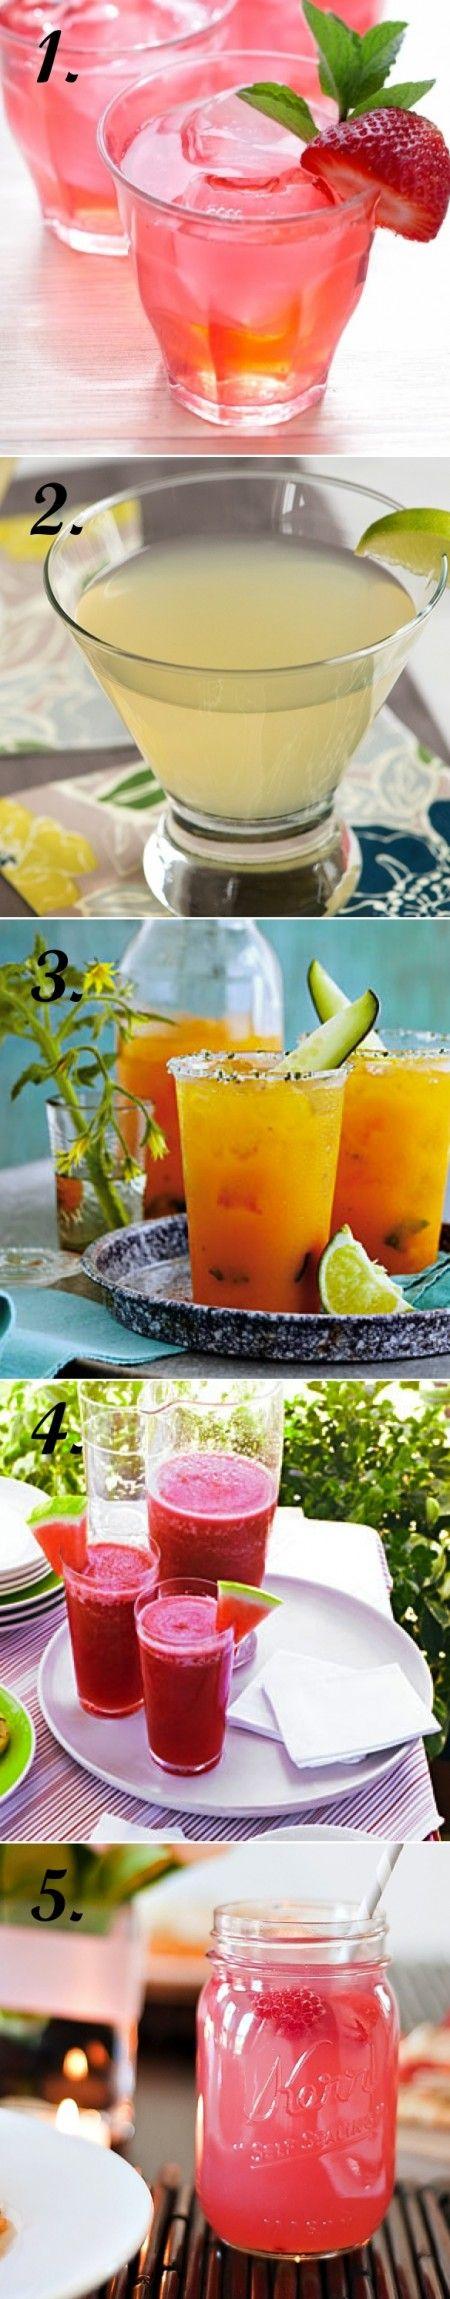 5 cócteles para refrescar este fin de semana/5 cocktails to refresh this weekend